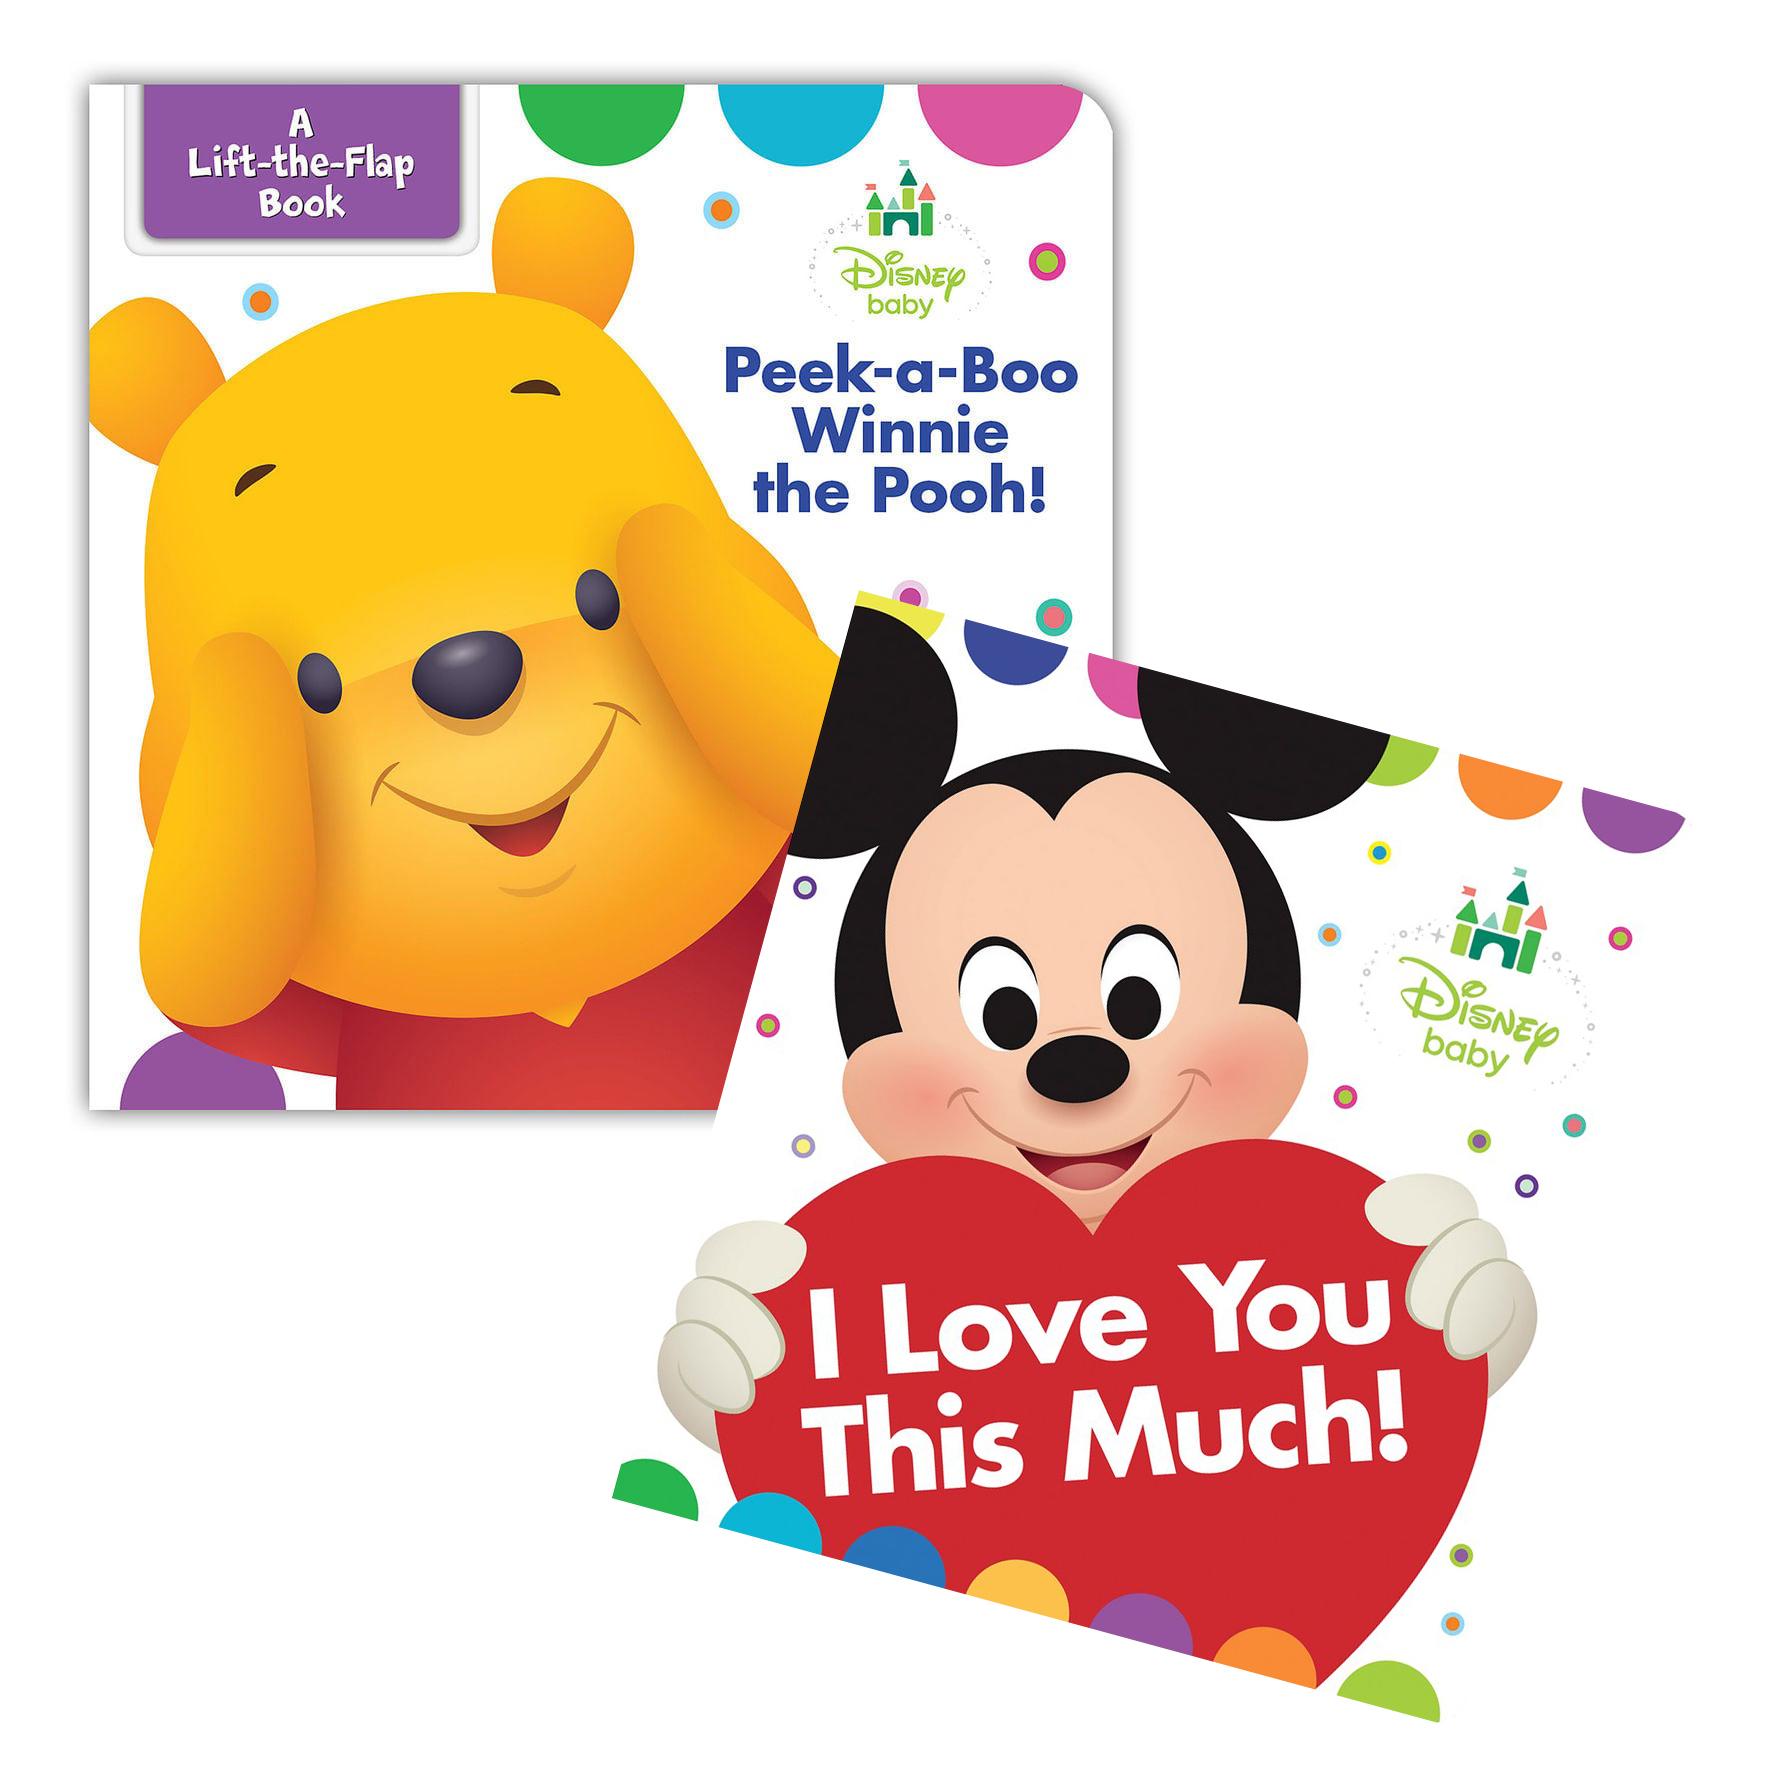 DisneyBaby_Maruyama_DisneyBaby.jpg